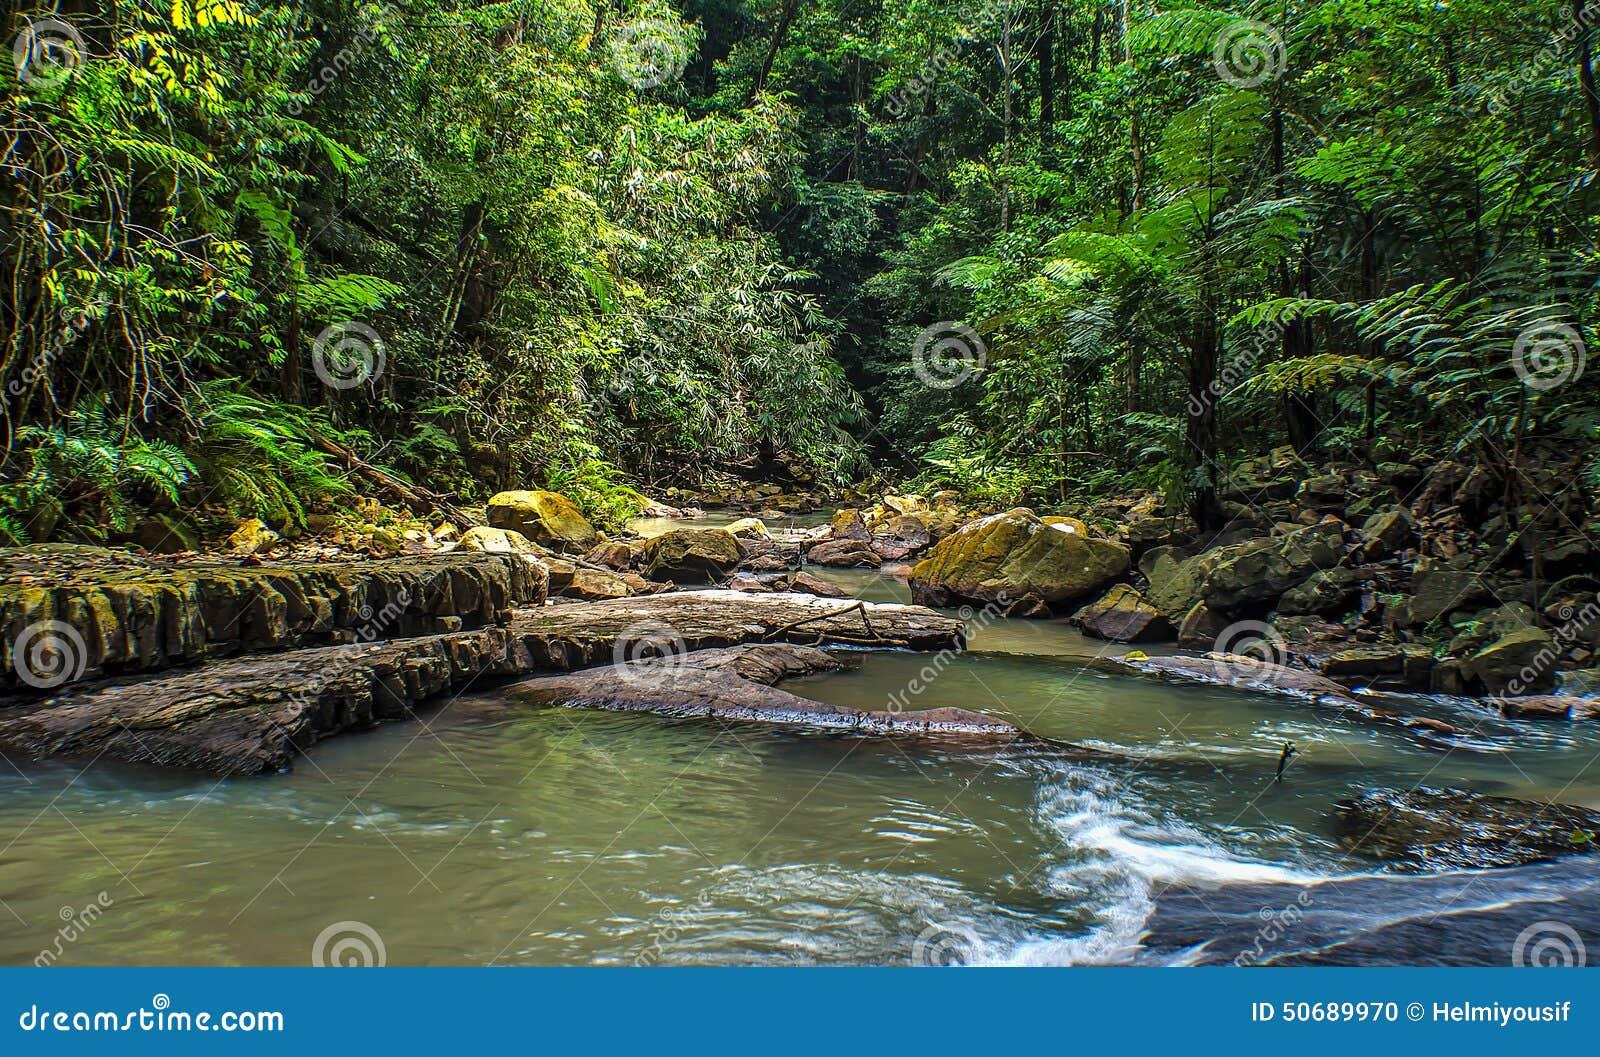 Download 雨林密林 库存照片. 图片 包括有 安排, 绿色, ,并且, 旅行, 彩虹, 艺术, 爱好健美者, 密林 - 50689970